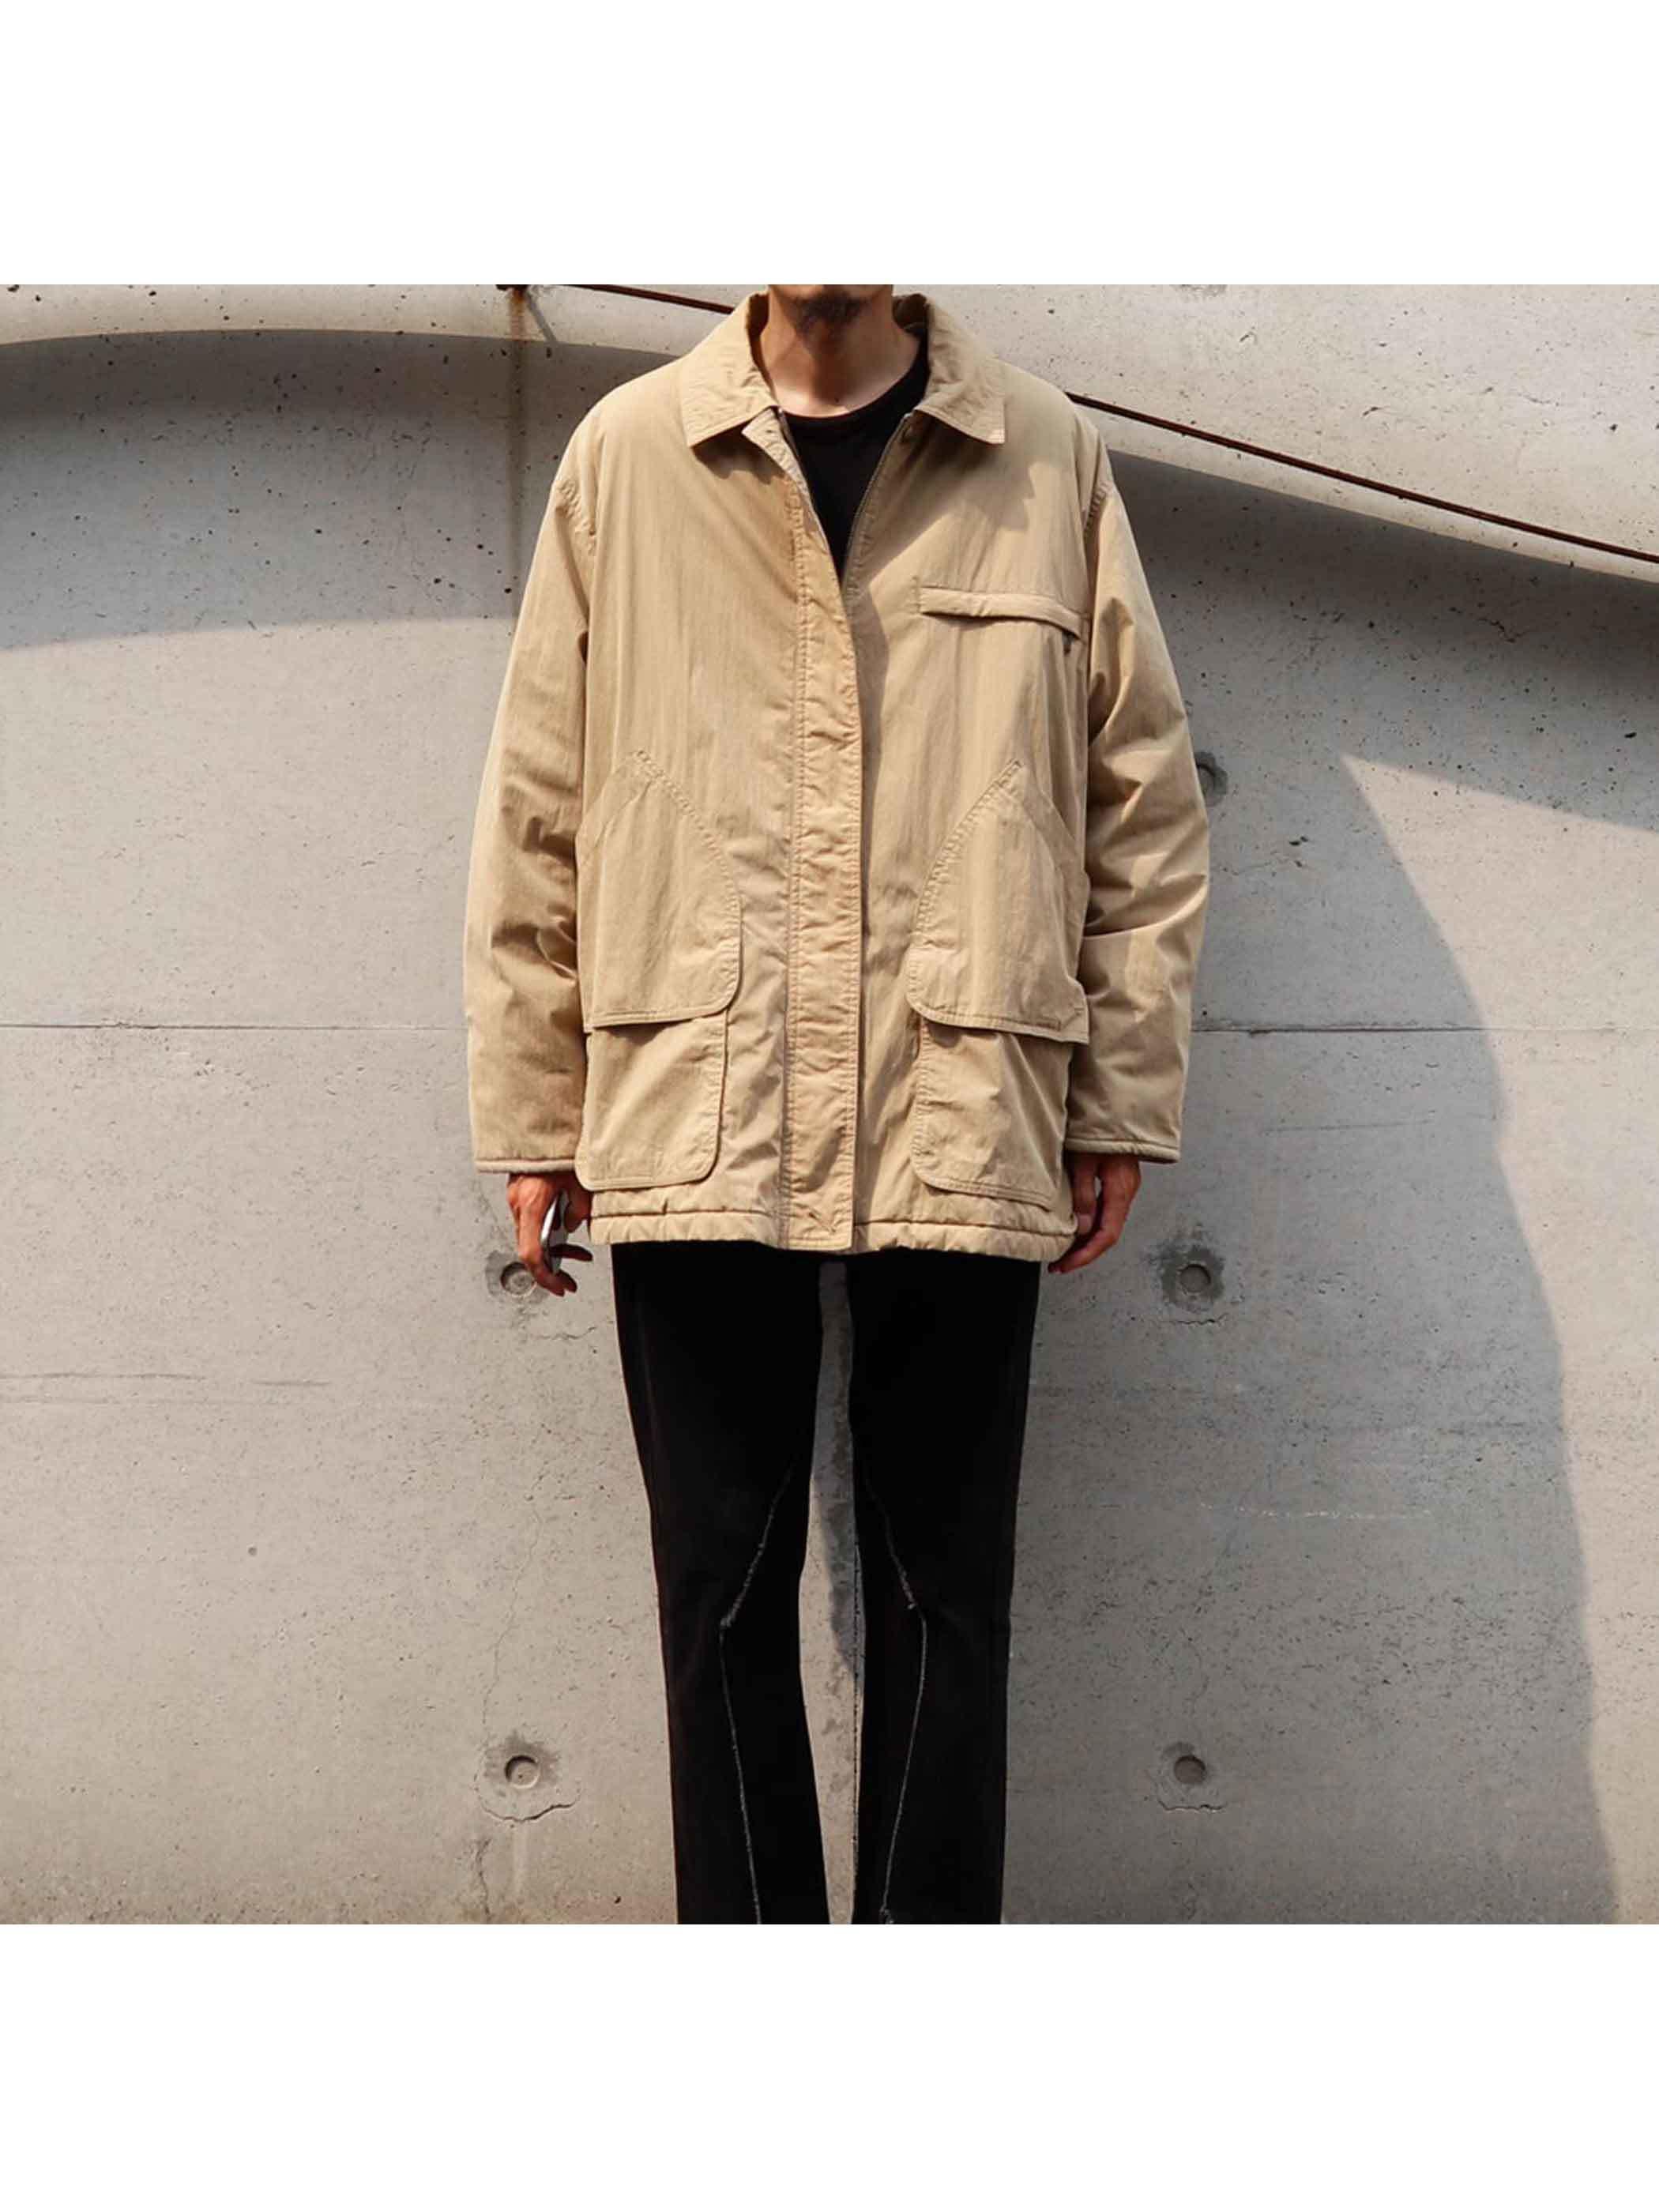 90's TIMBERLAND ハンティングスタイル パディングジャケット [XL]